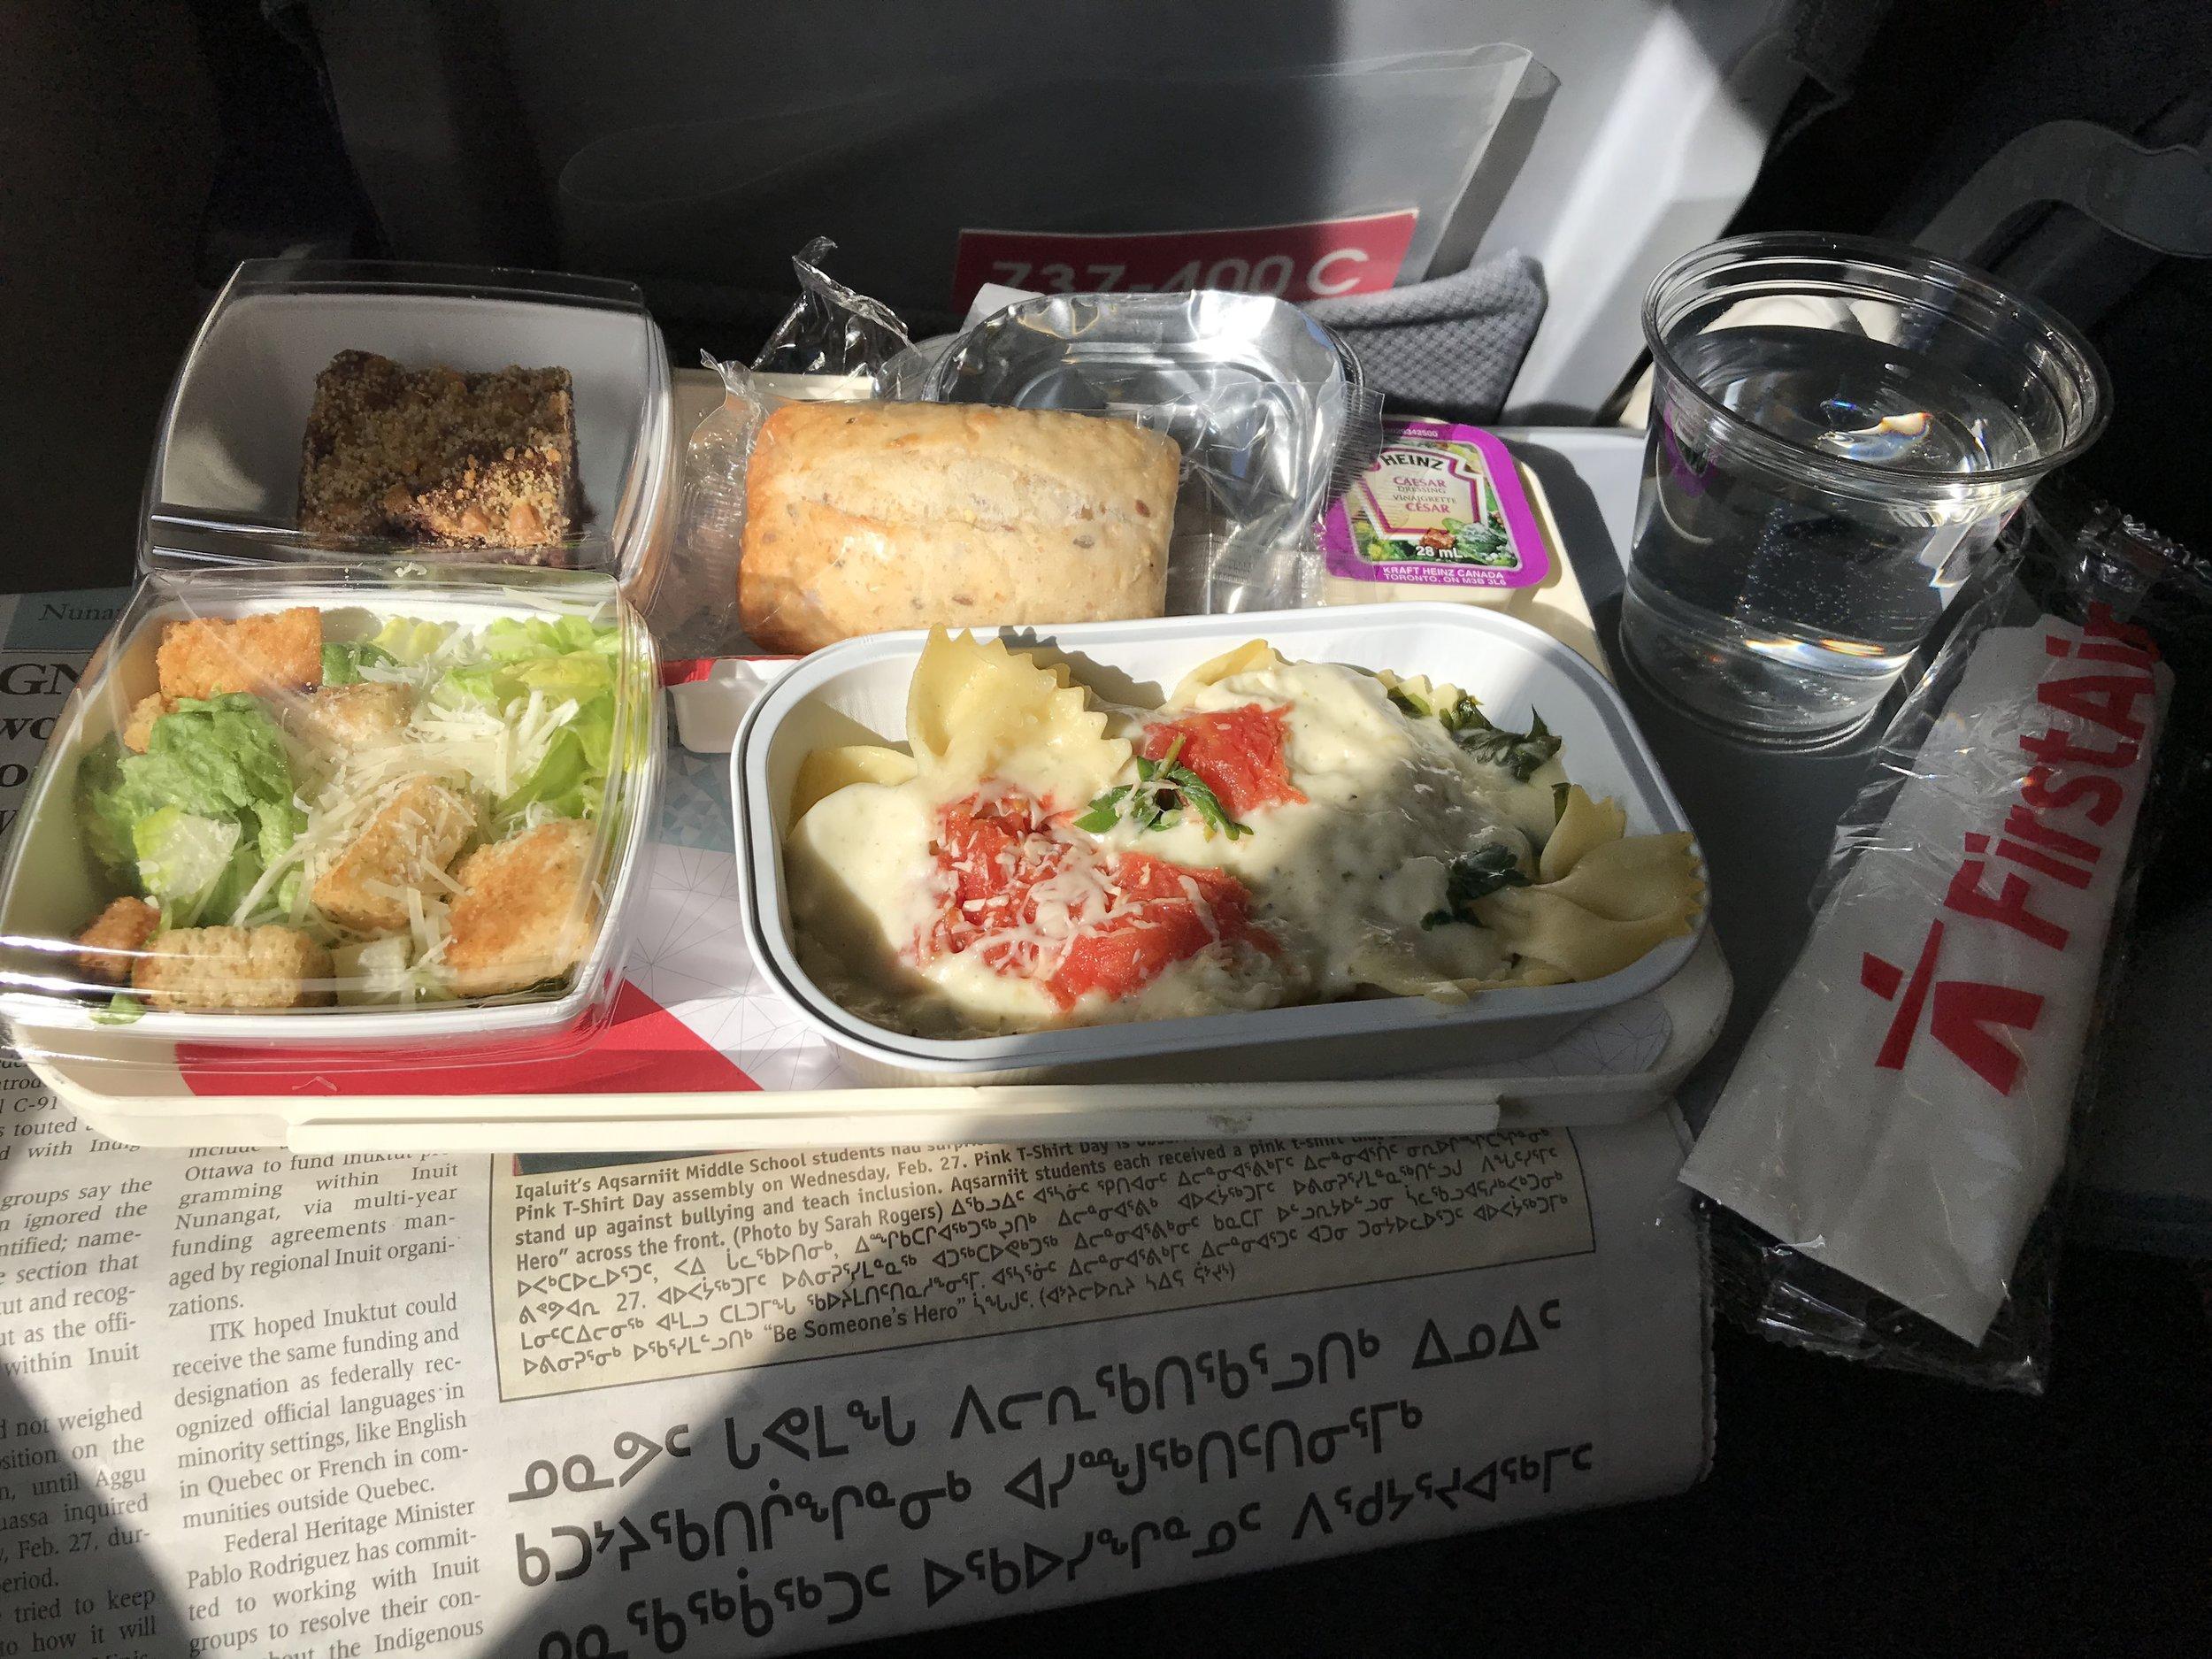 First Air serves a FREE lunch!